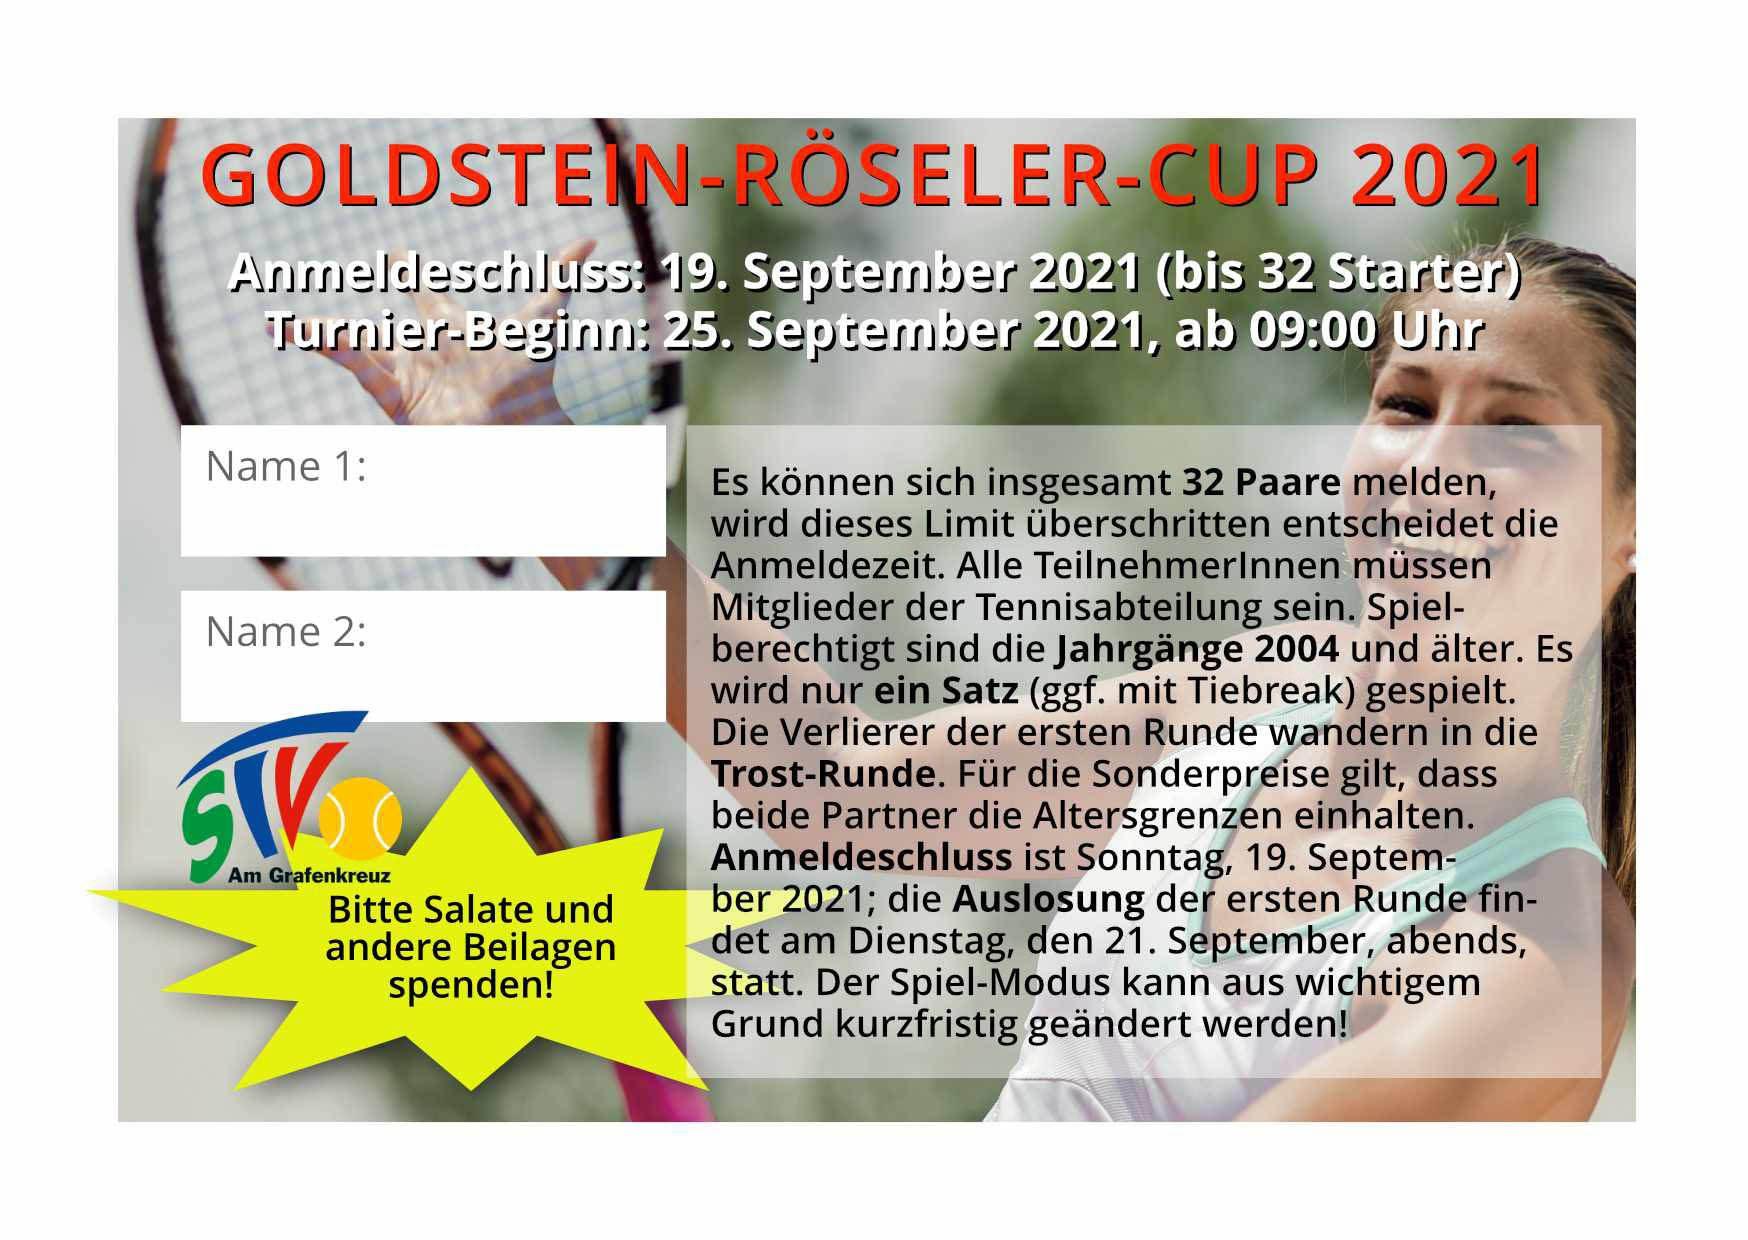 Goldstein&Röseler-Cup 2021_09_25 Anmeldung